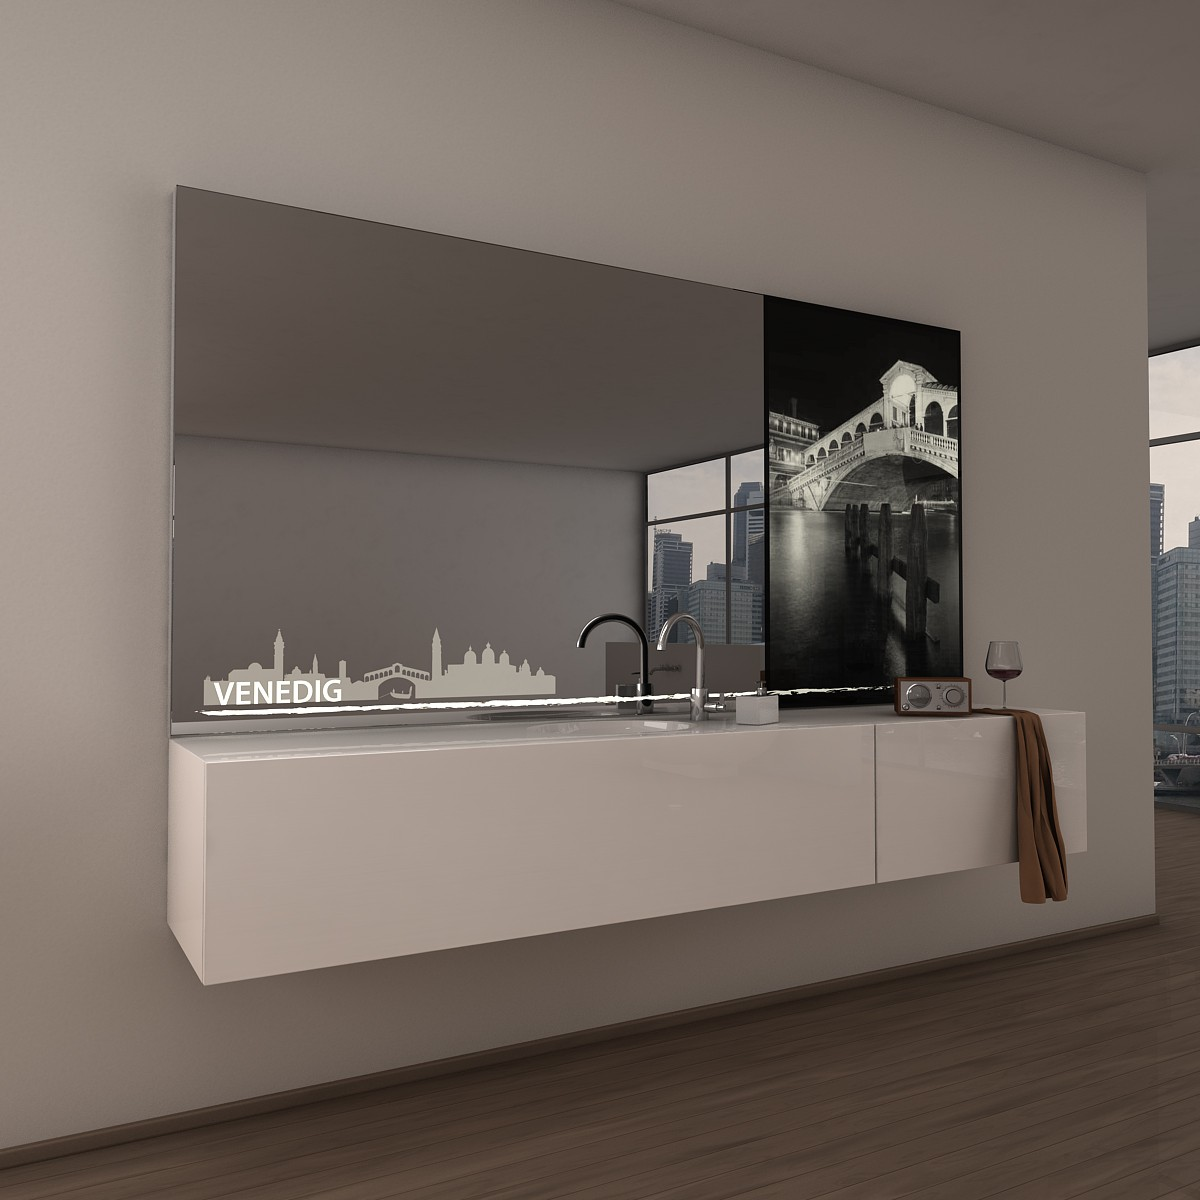 Teil-Lack-Wandspiegel Venedig